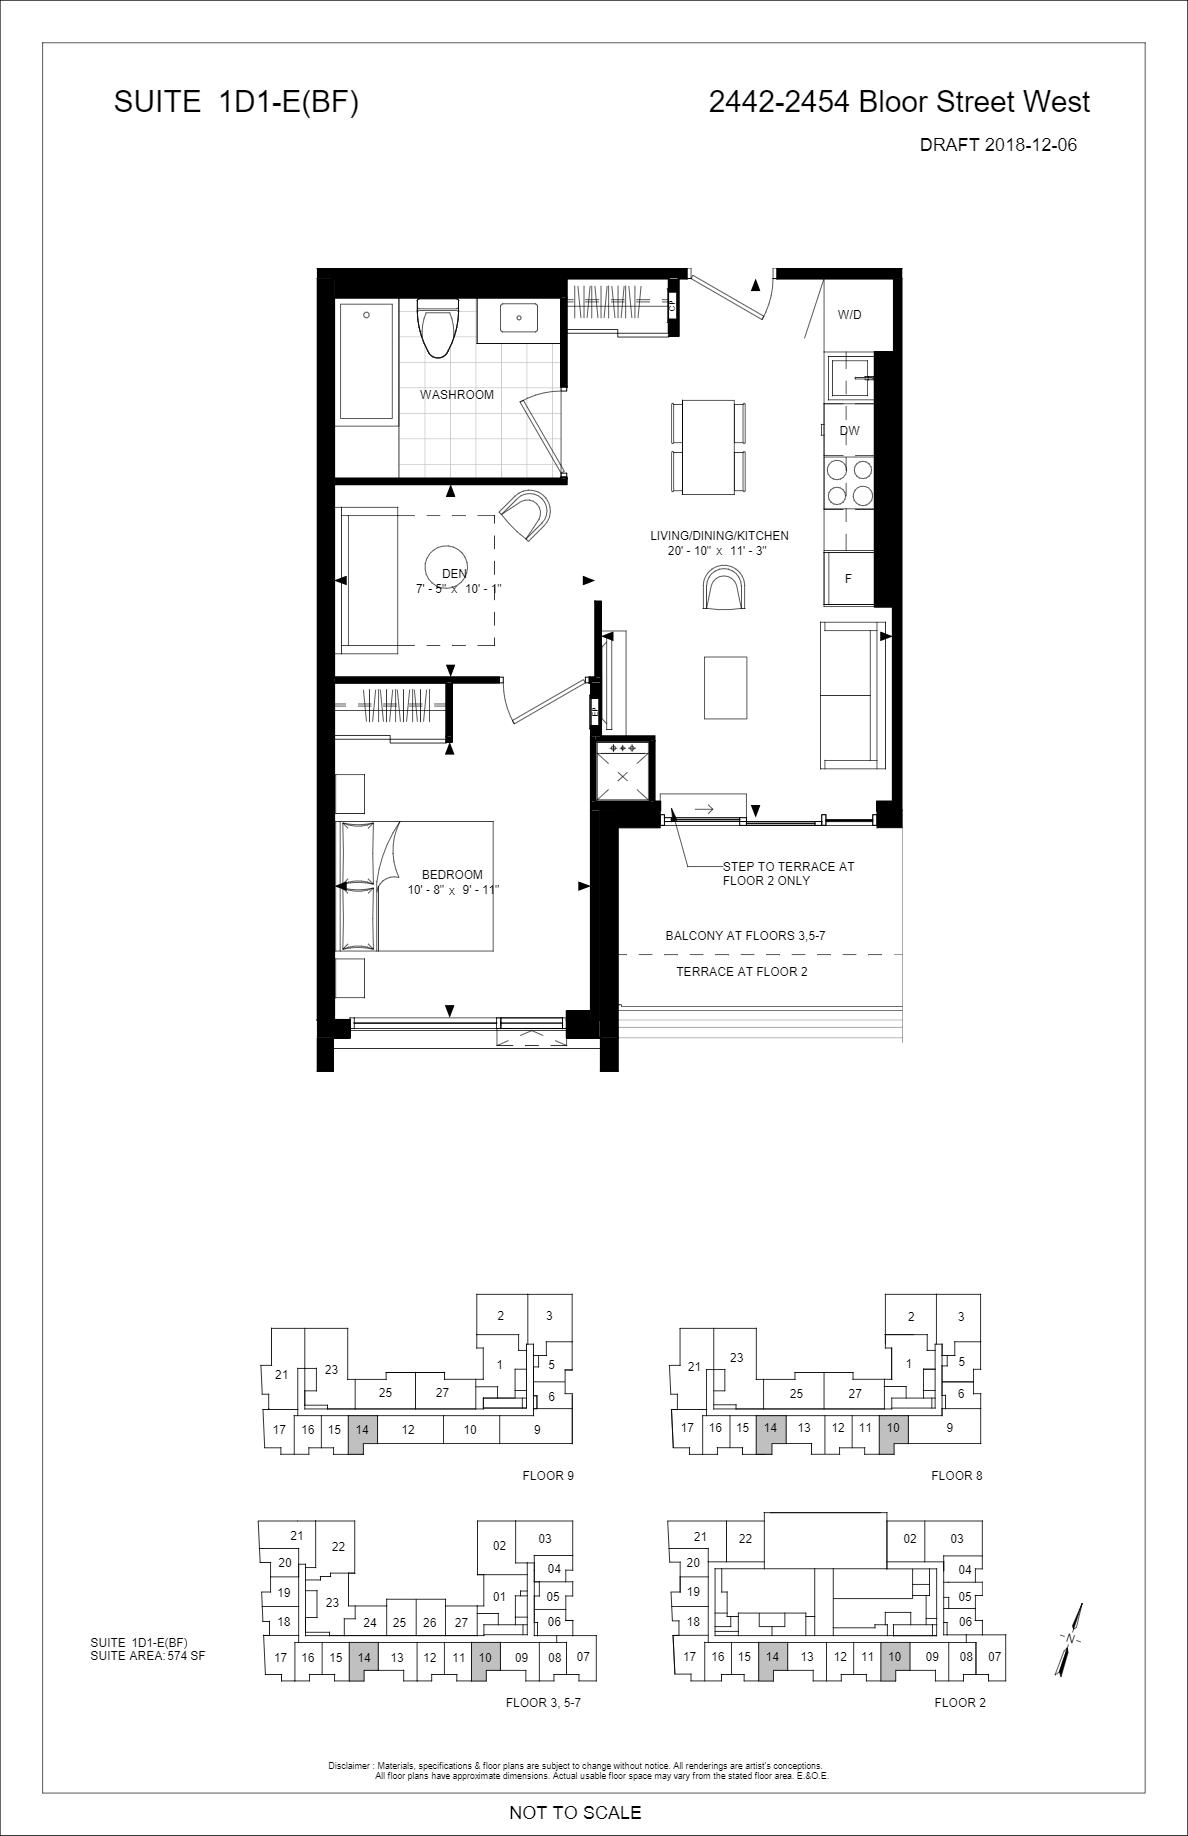 Bijou On Bloor Condos Price Lists Floor Plans Precondo